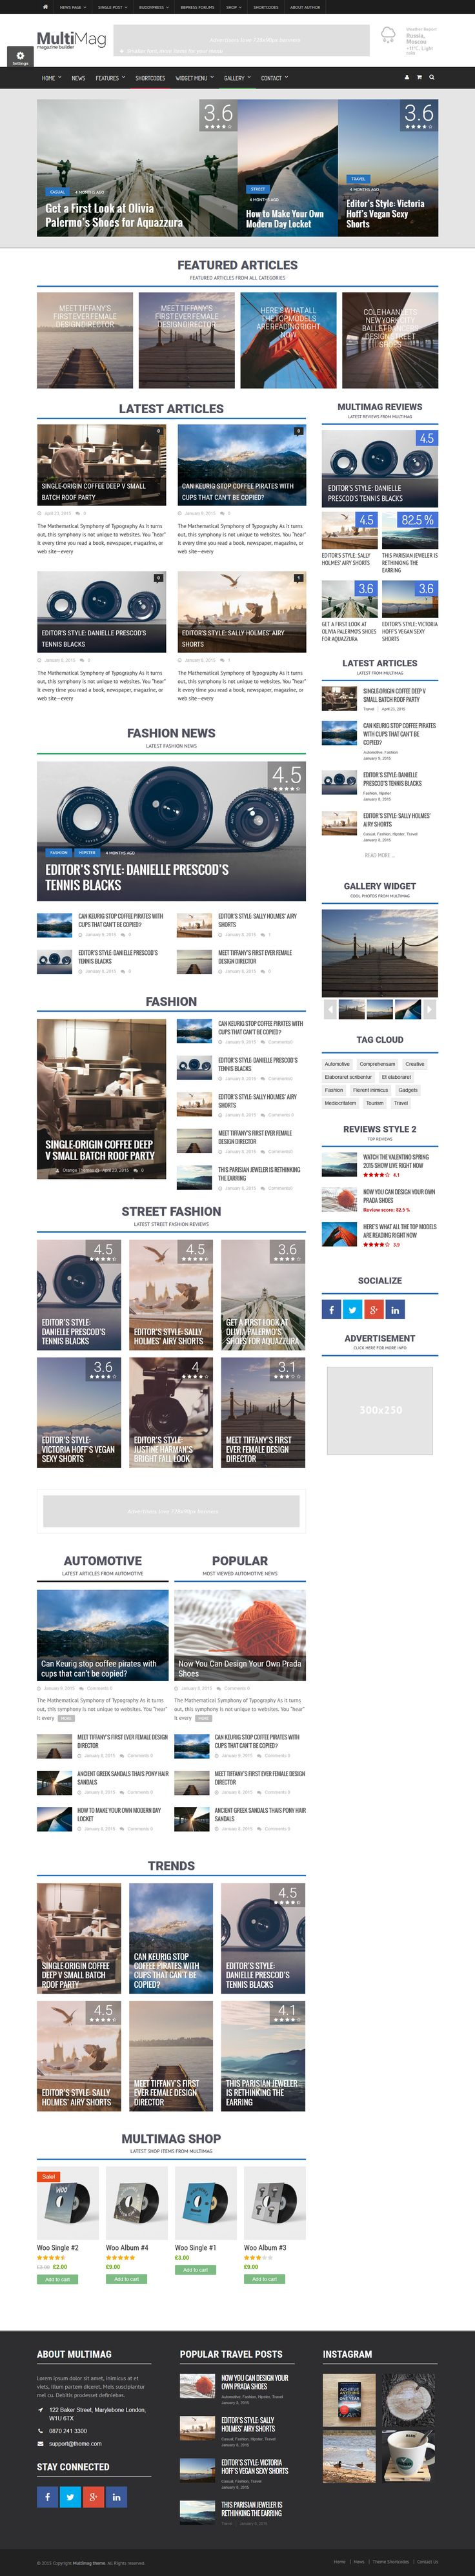 MultiMag - Multipurpose Magazine Wordpress Theme #wptheme #wordpress #magazinetheme Live Preview and Download: http://themeforest.net/item/multimag-multipurpose-magazine-theme/10057920?ref=ksioks